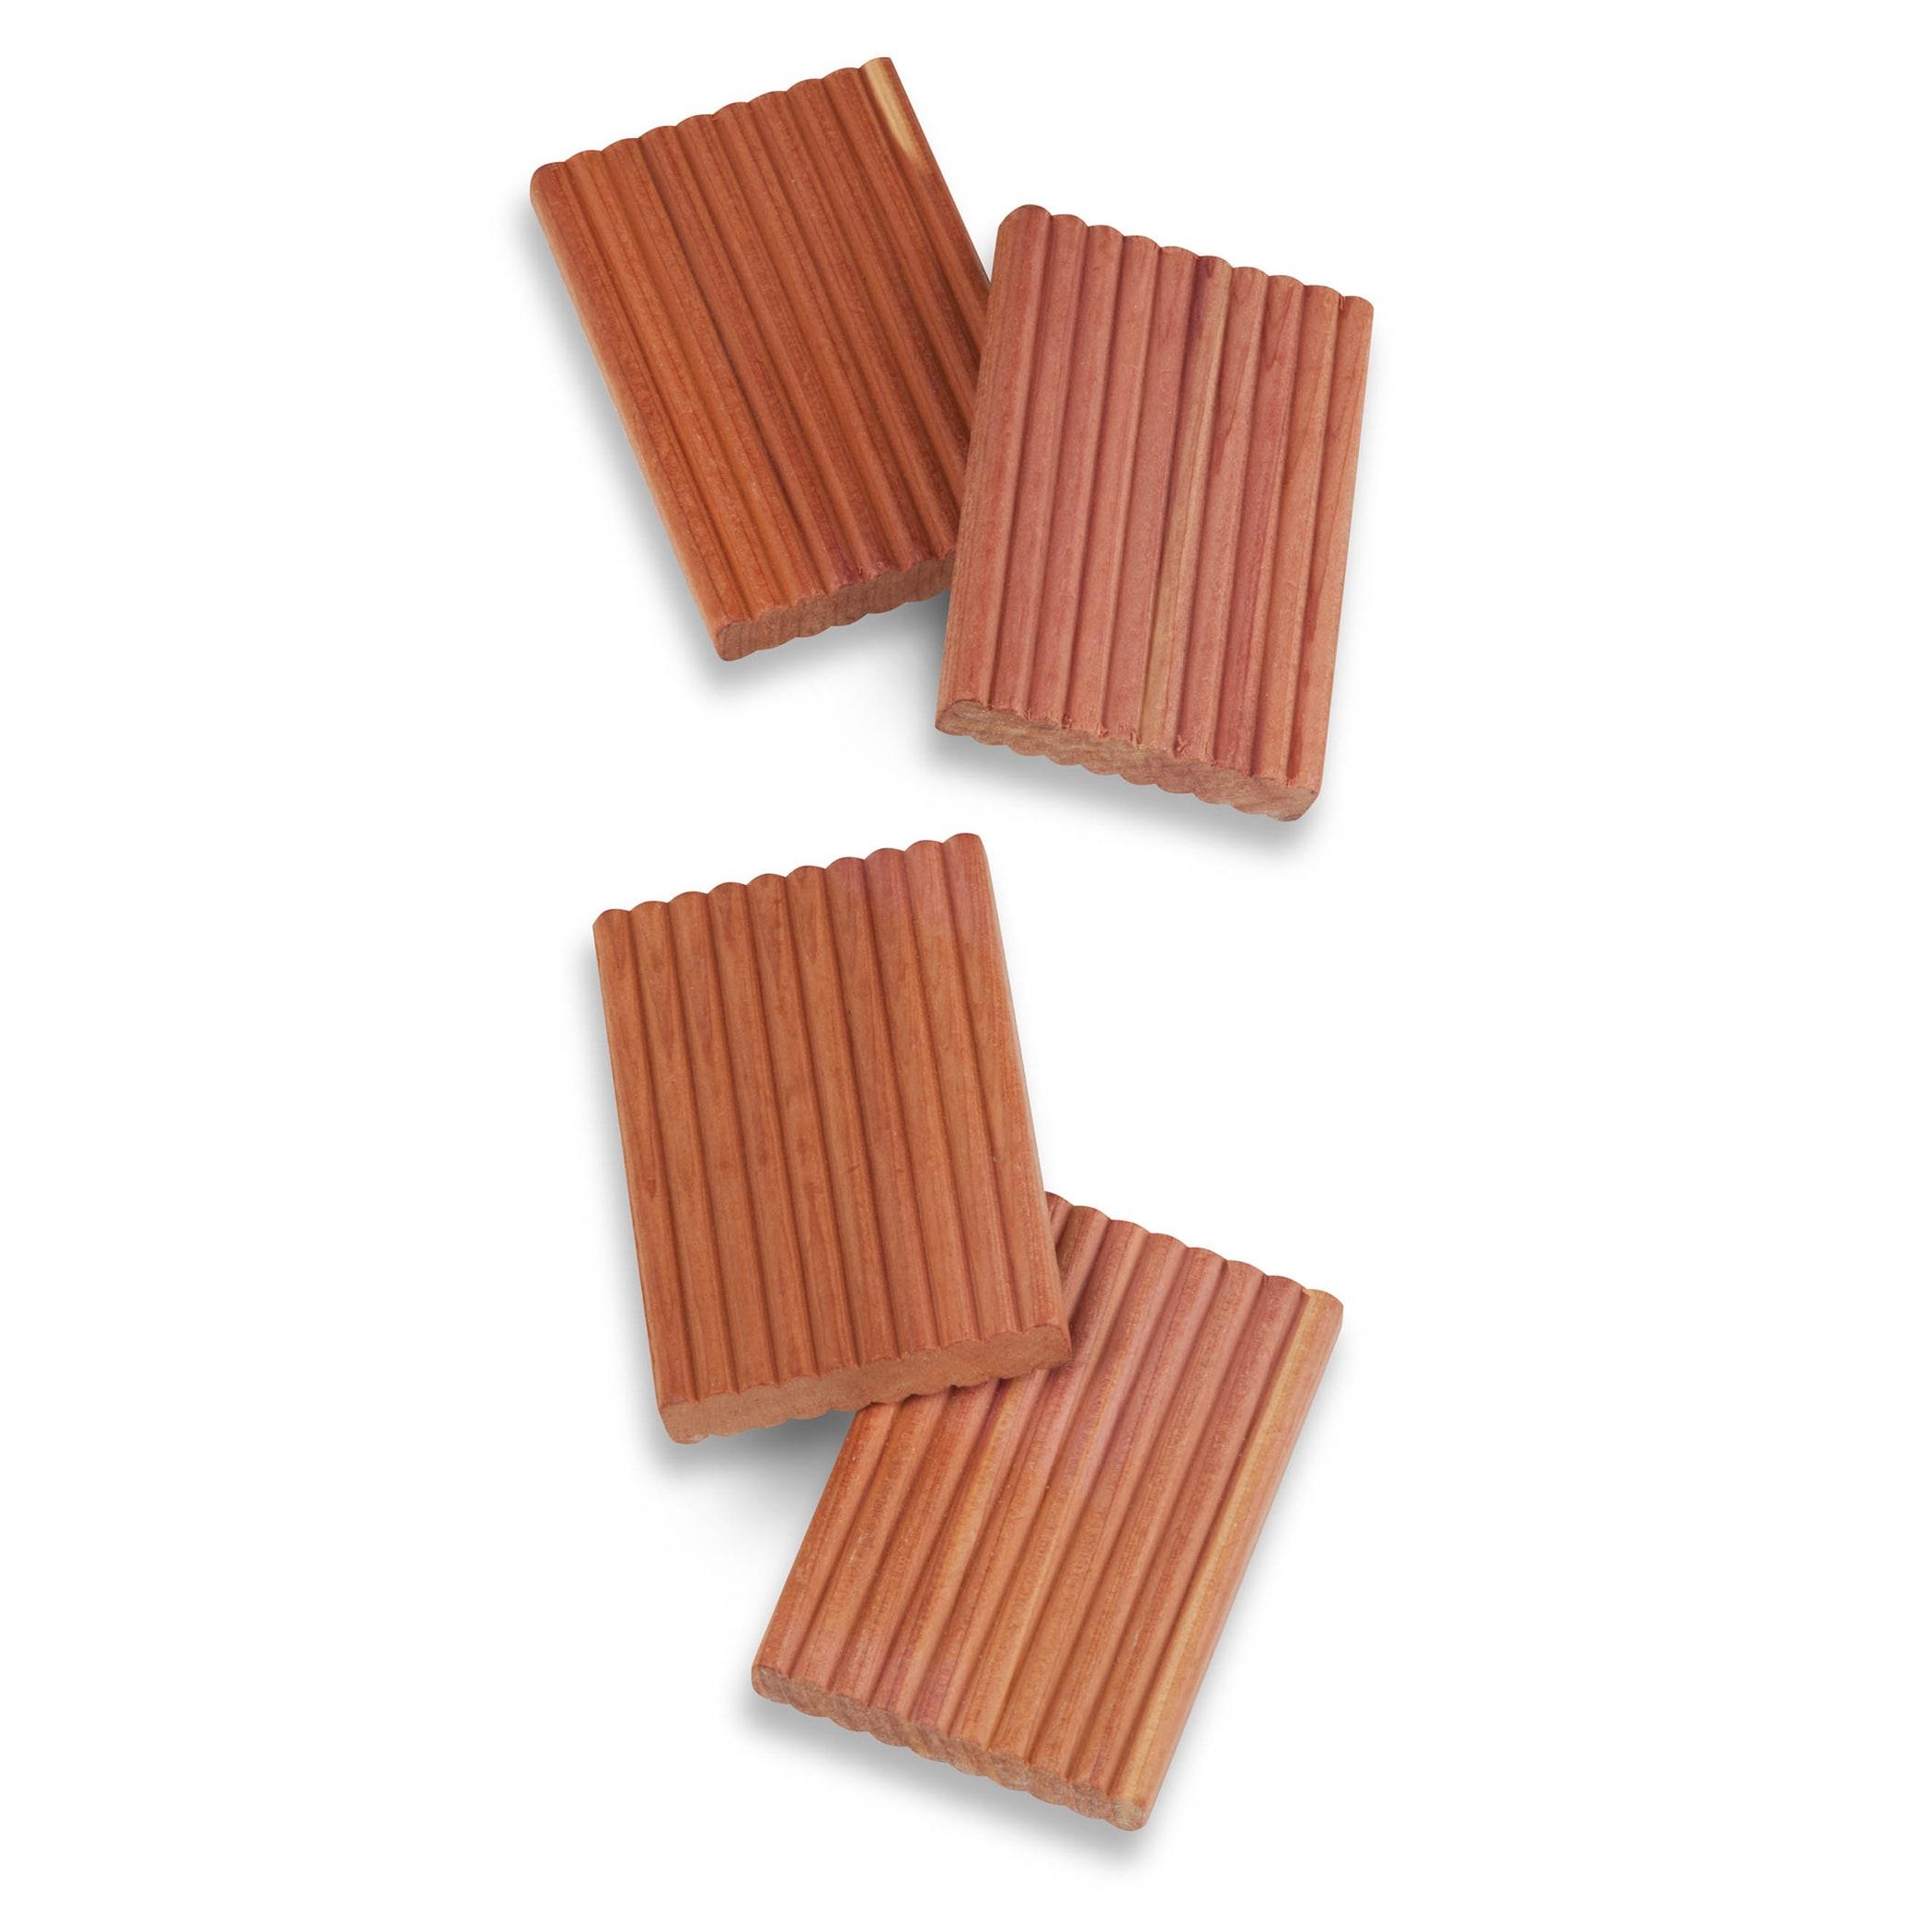 "Honey-Can-Do HNG-03470 2.75"" X 2"" Cedar-Lavender Blocks 4..."